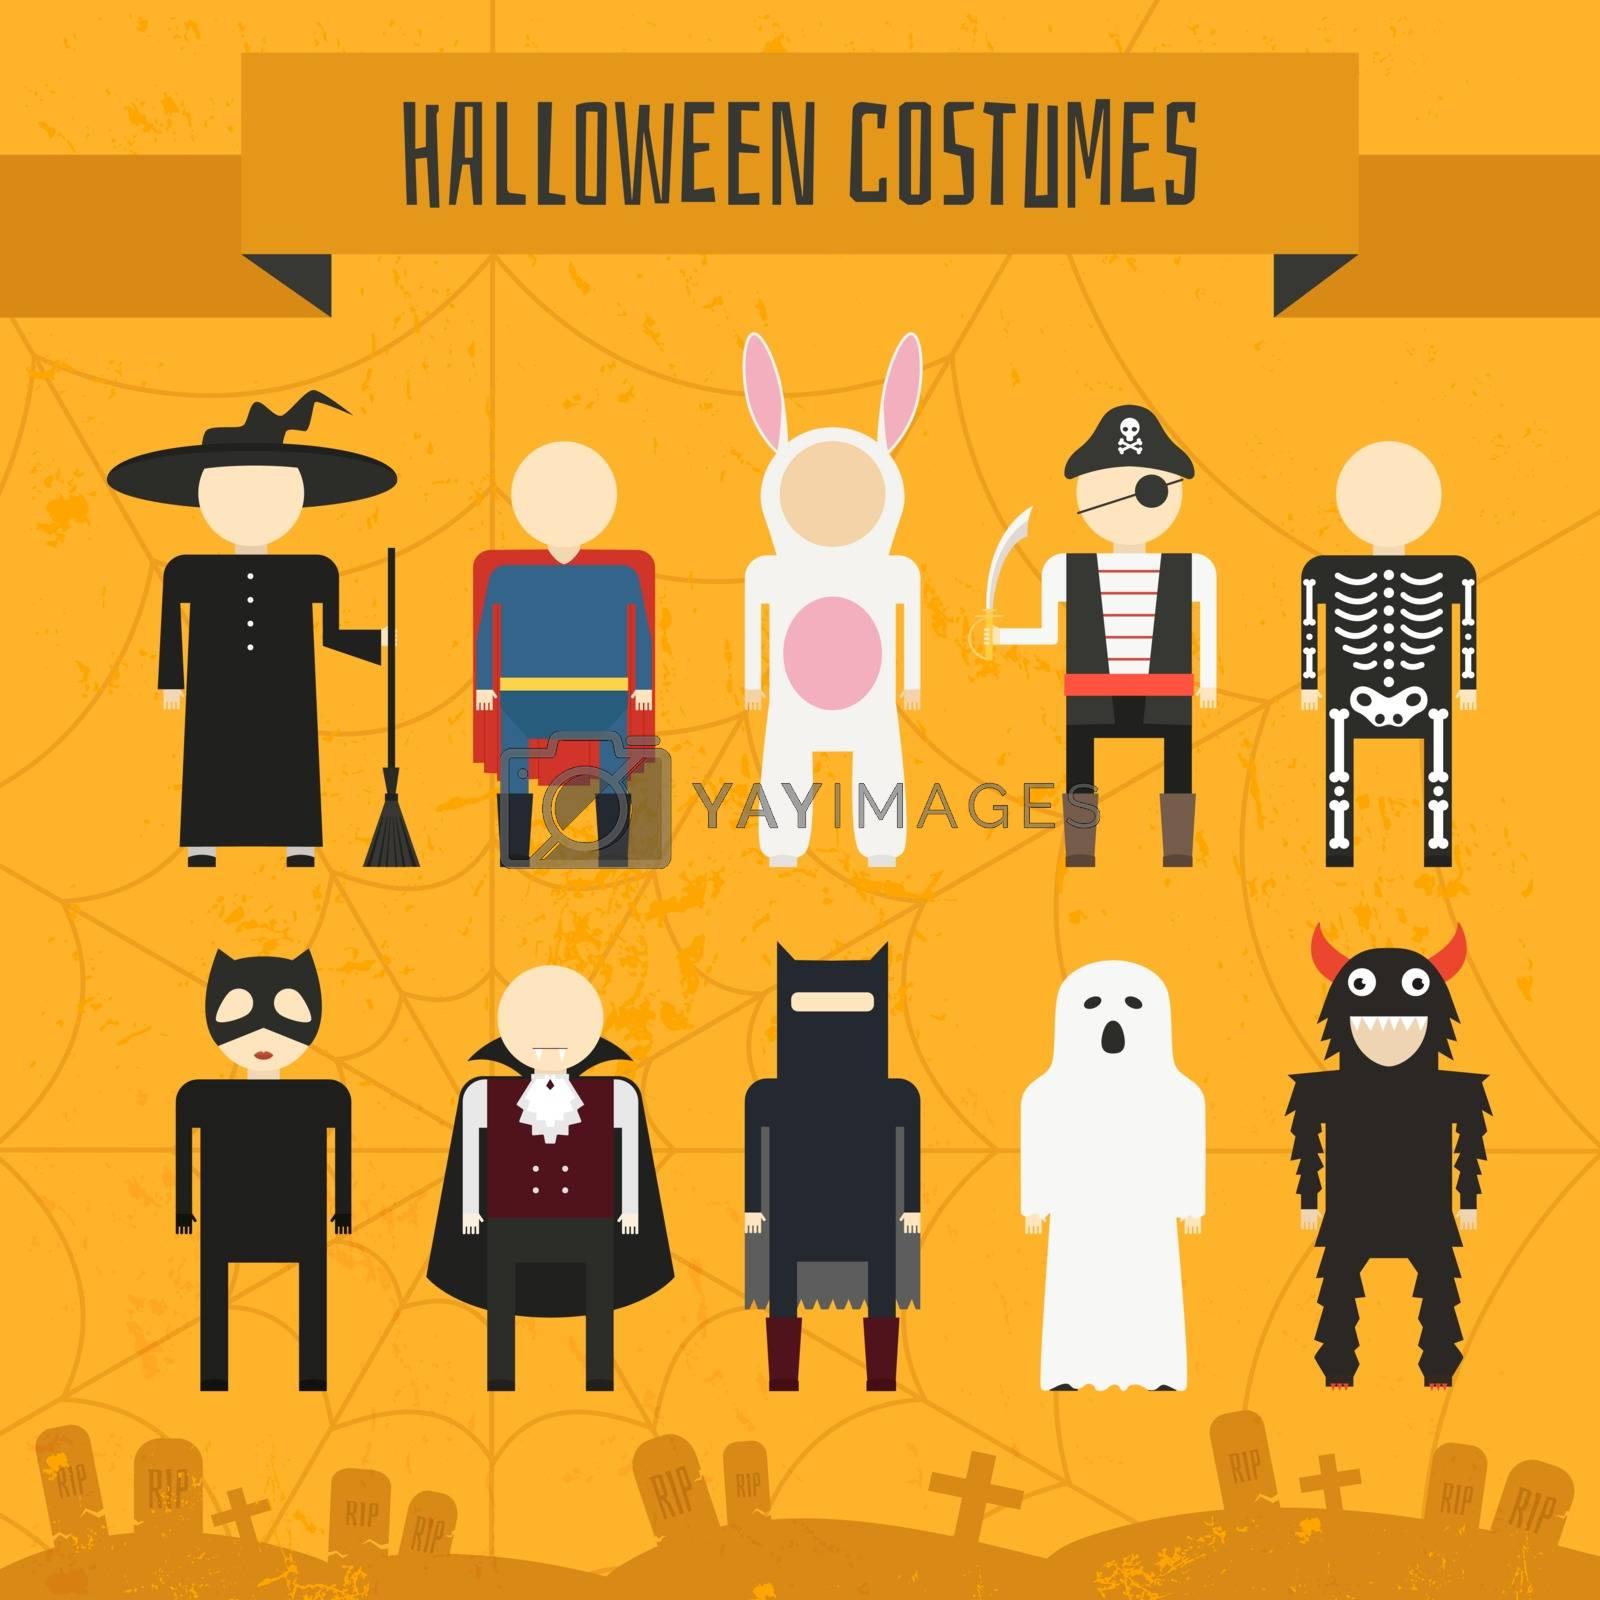 Illustration of popular halloween costumes, including vampire, rabbit, superhero, pirate, skeleton, monster, witch. Vector halloween illustration.